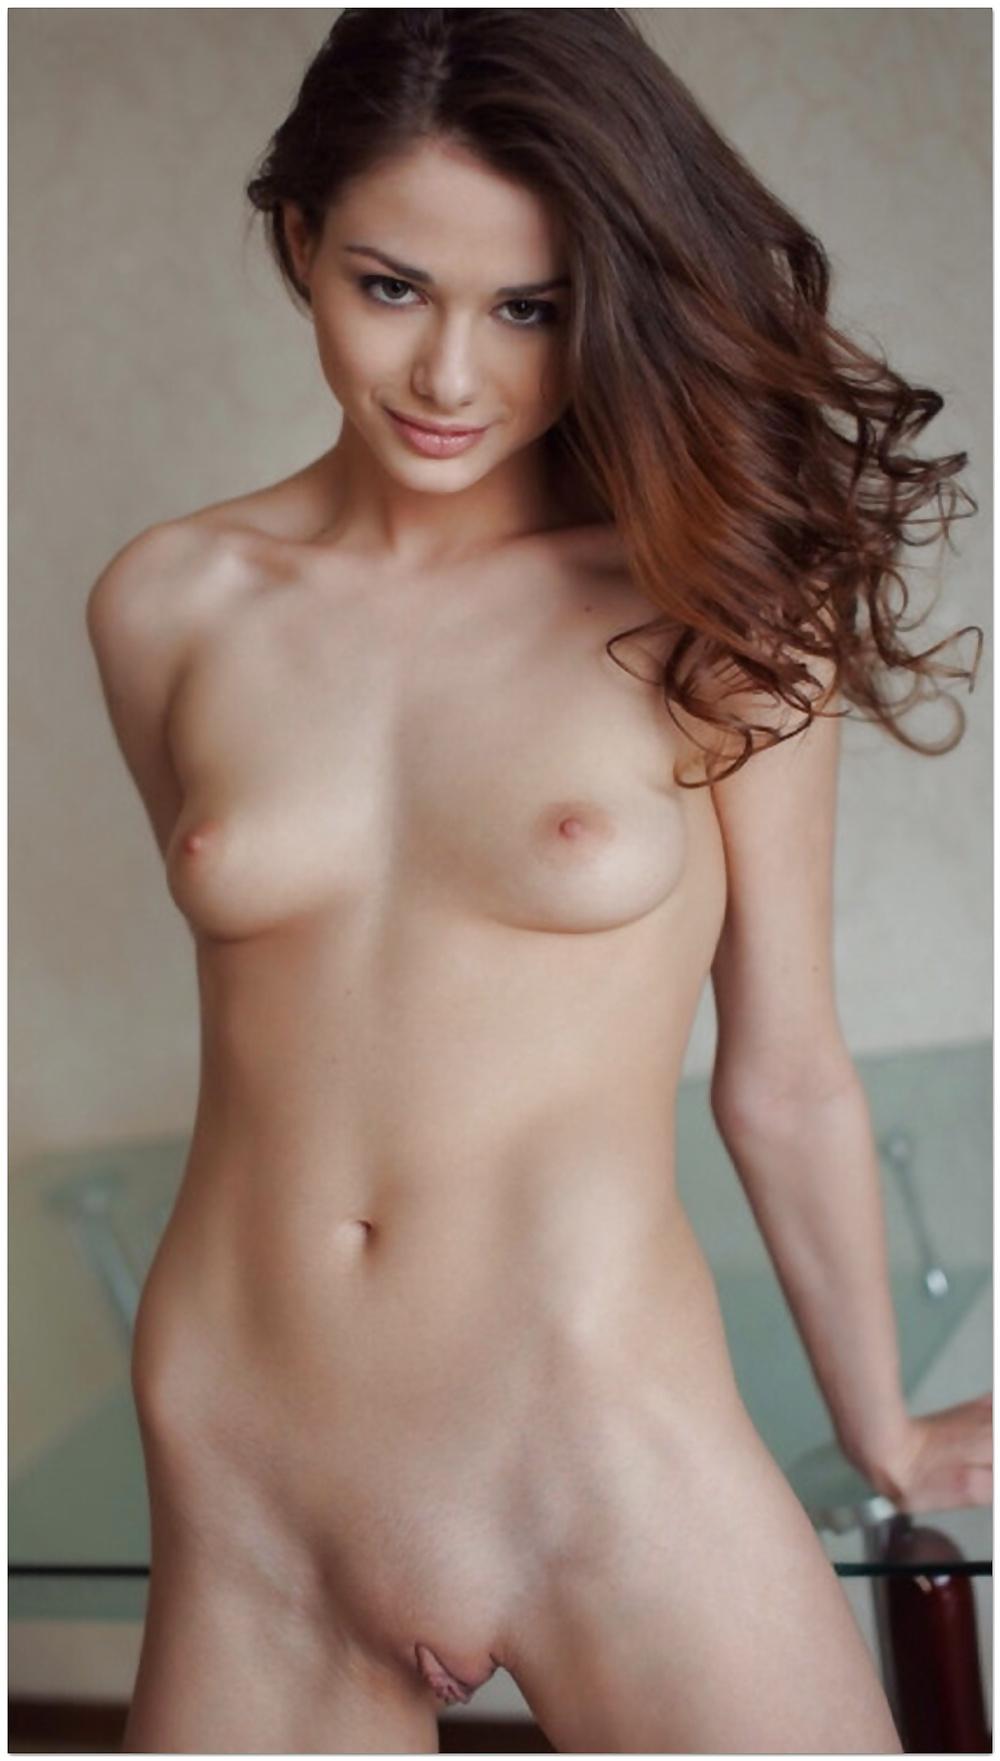 Nymphe Sex